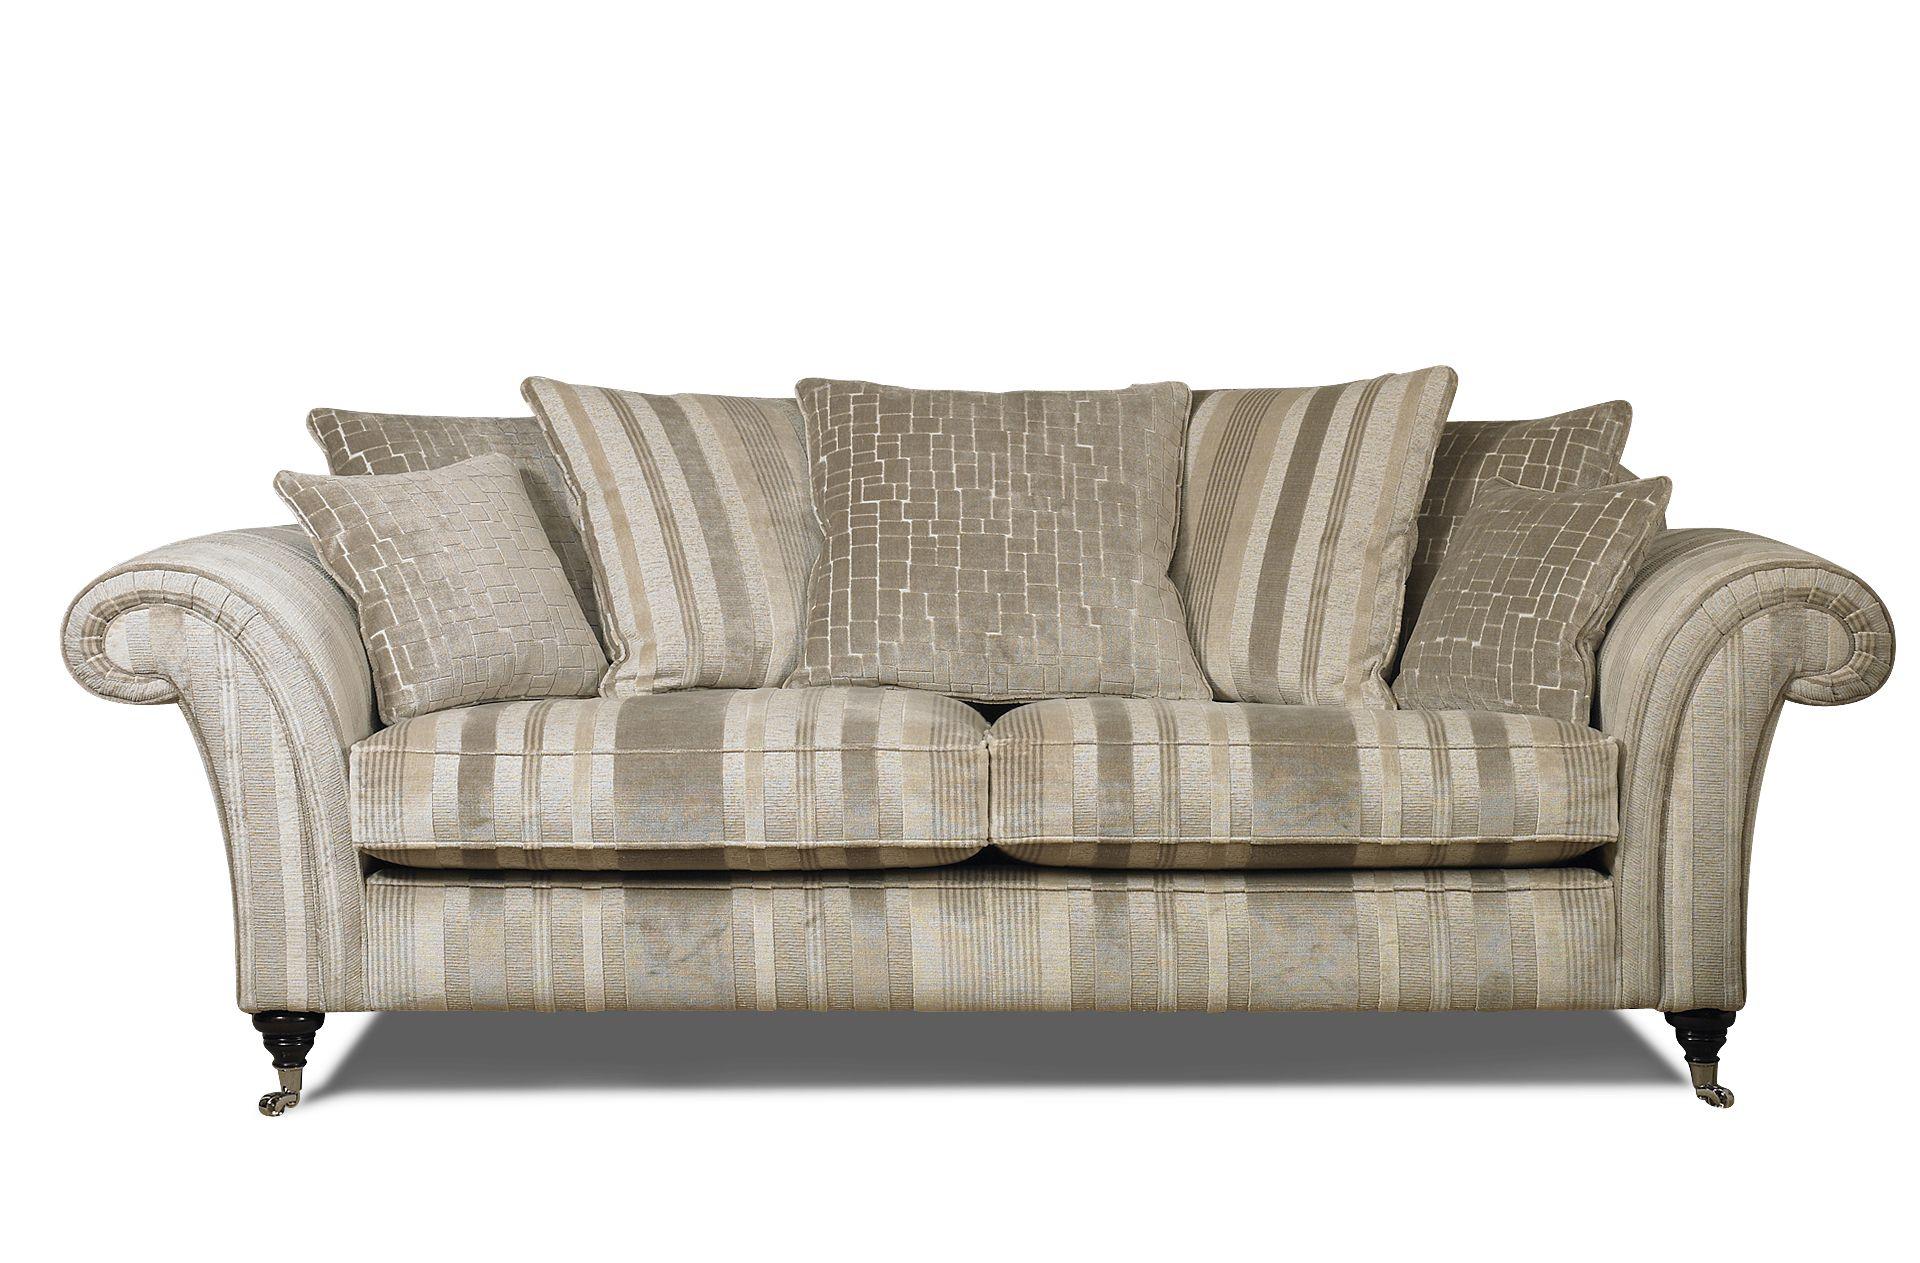 Jasper Scatter Back Upholstery handcrafted english elegant